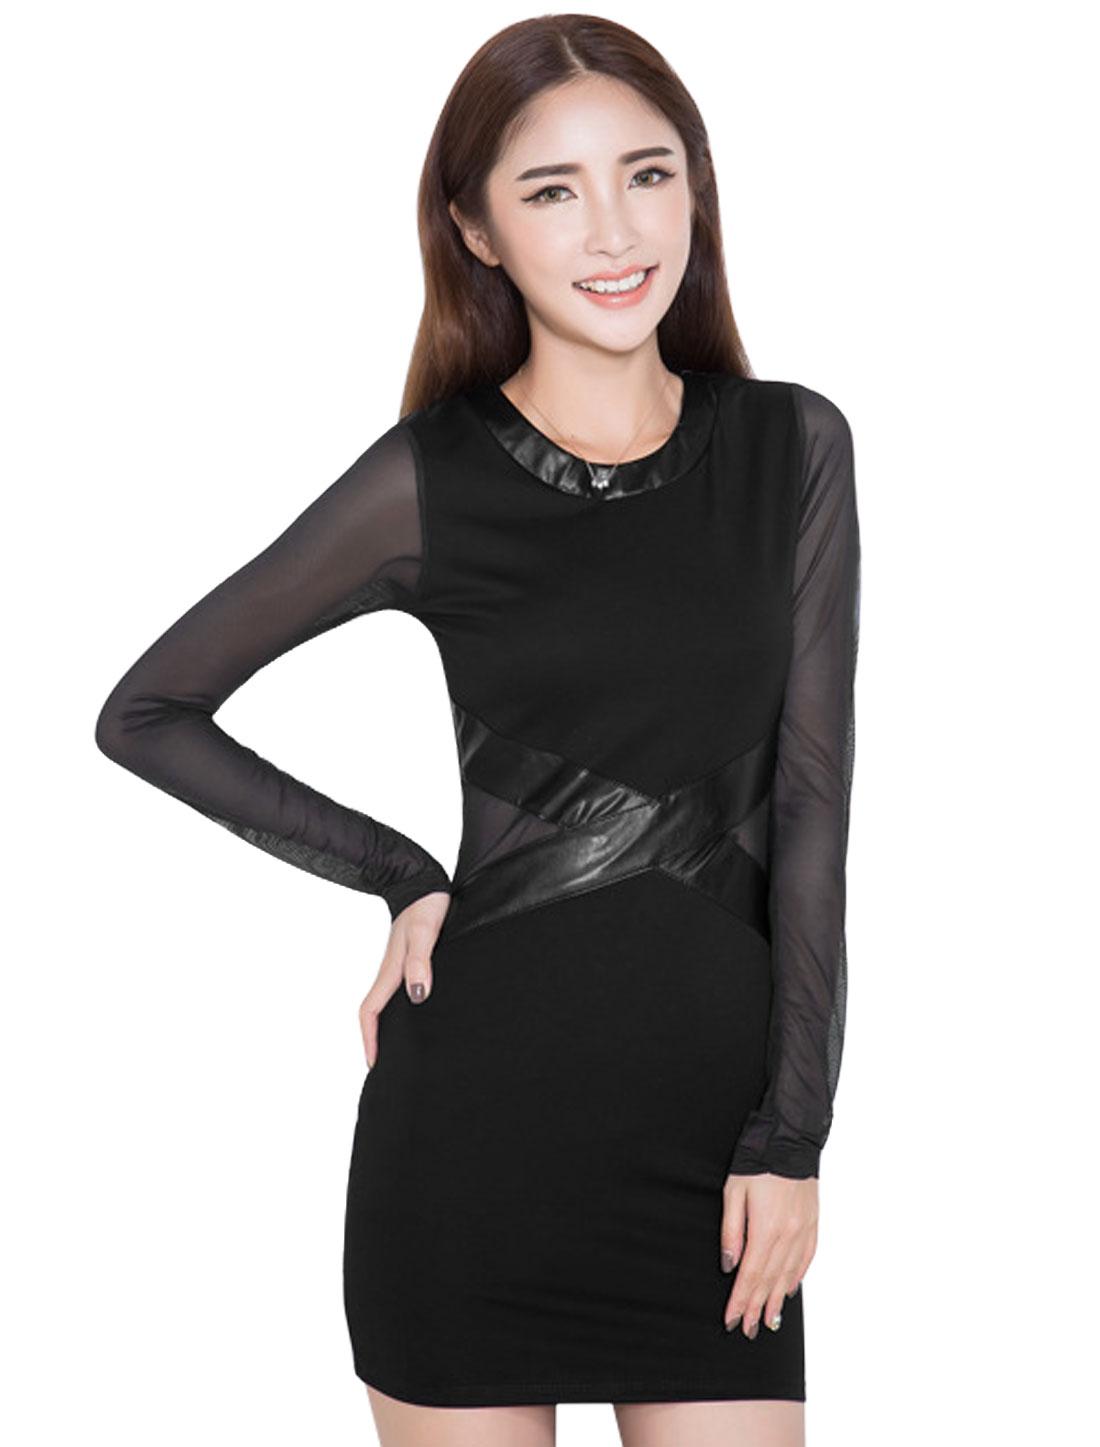 Ladies Black Pu Mesh Splice Long Sleeves Leisure Sheath Dress S